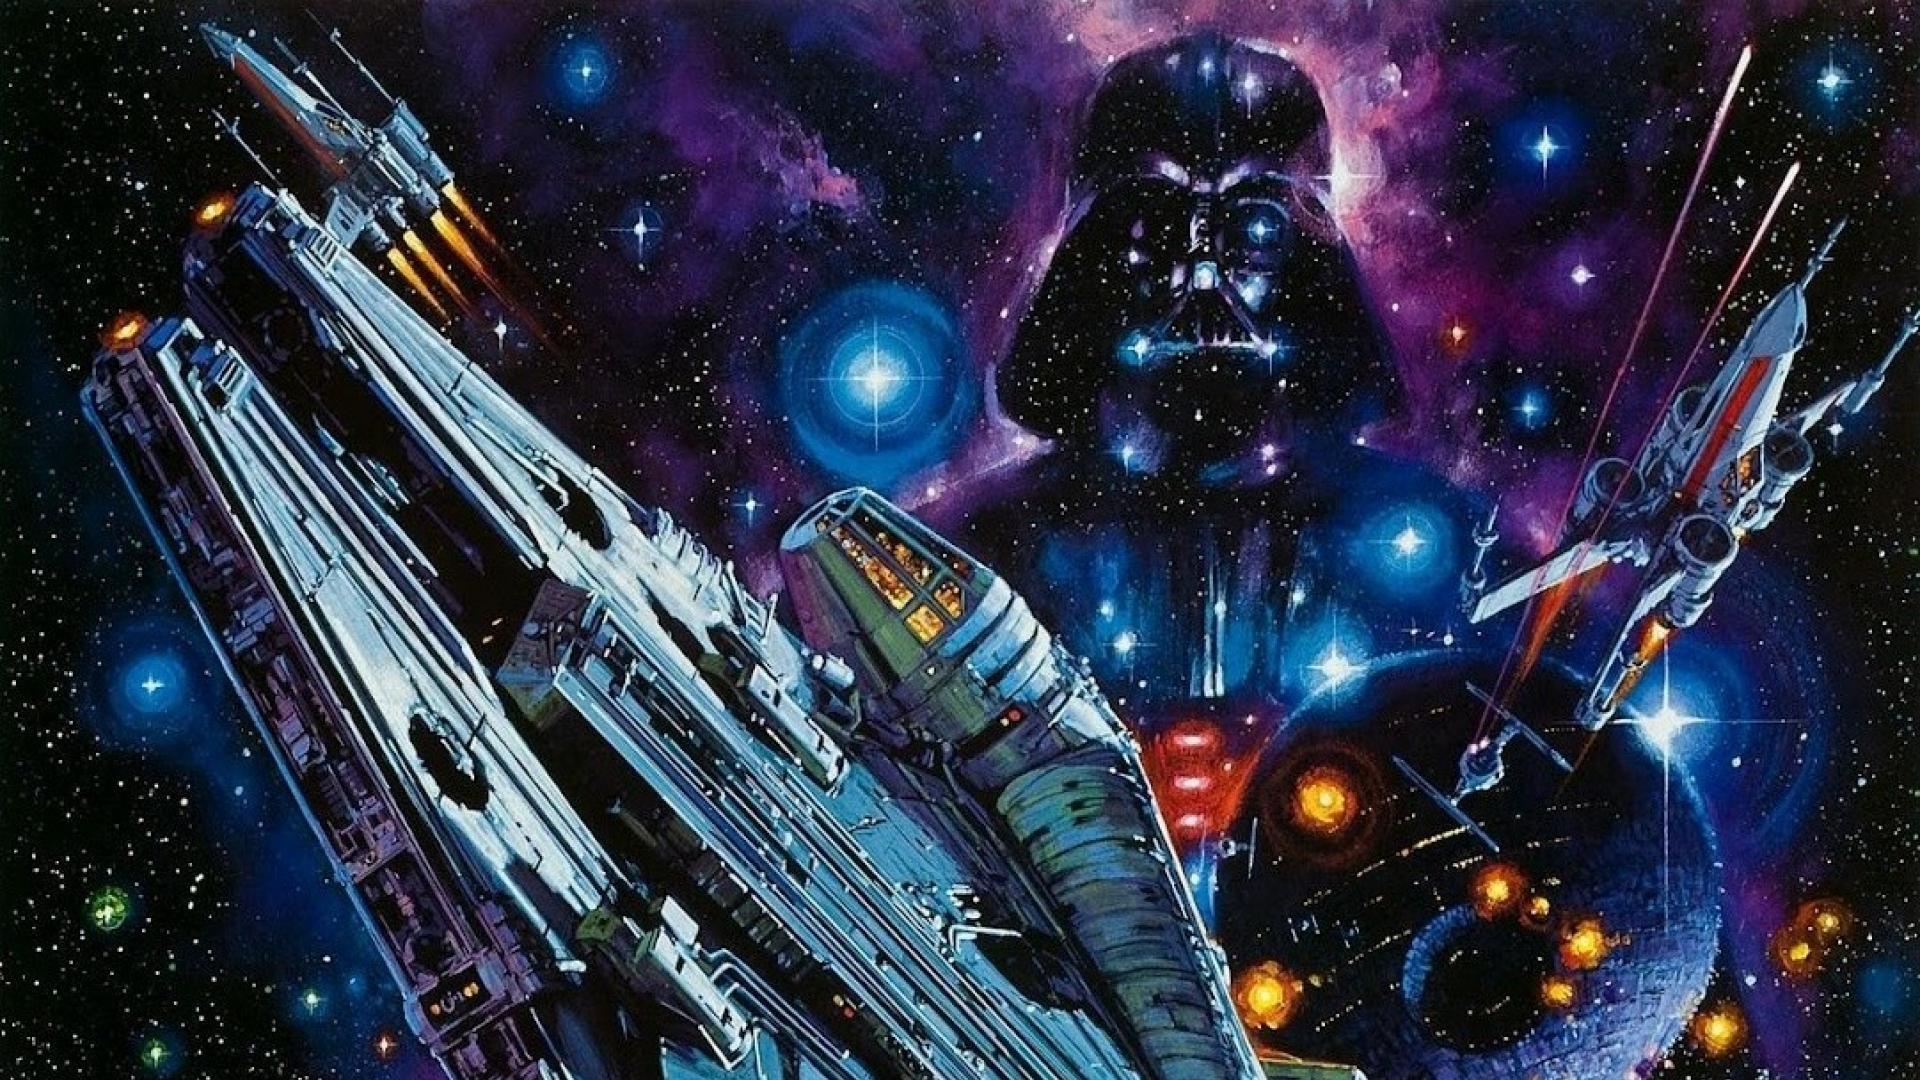 Darth Vader Millennium Falcon , HD Wallpaper & Backgrounds